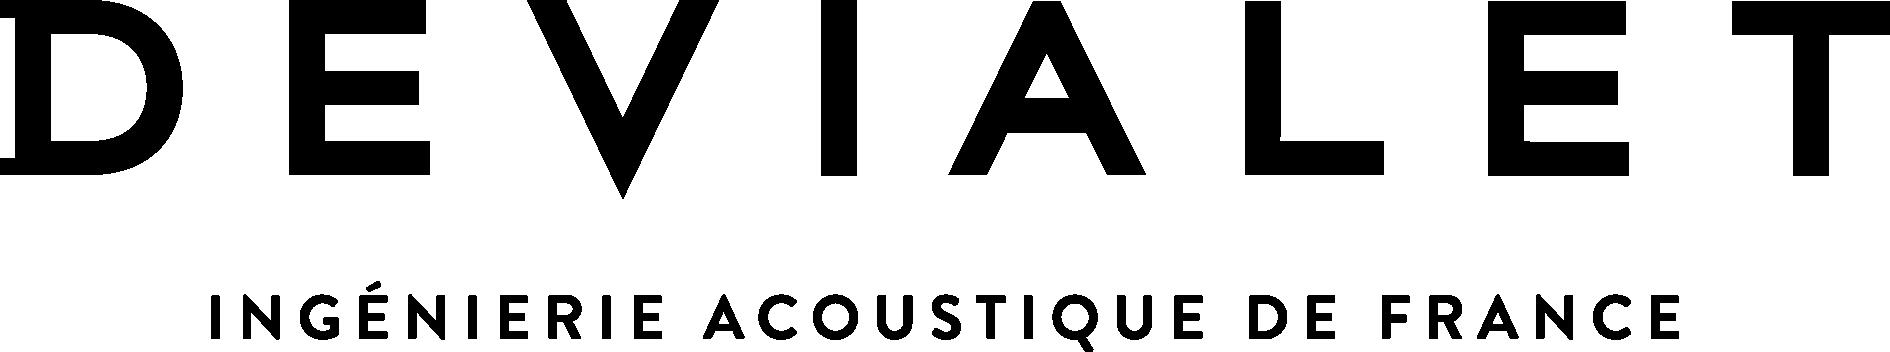 DEVIALET_ingenierie_logo_Big.png